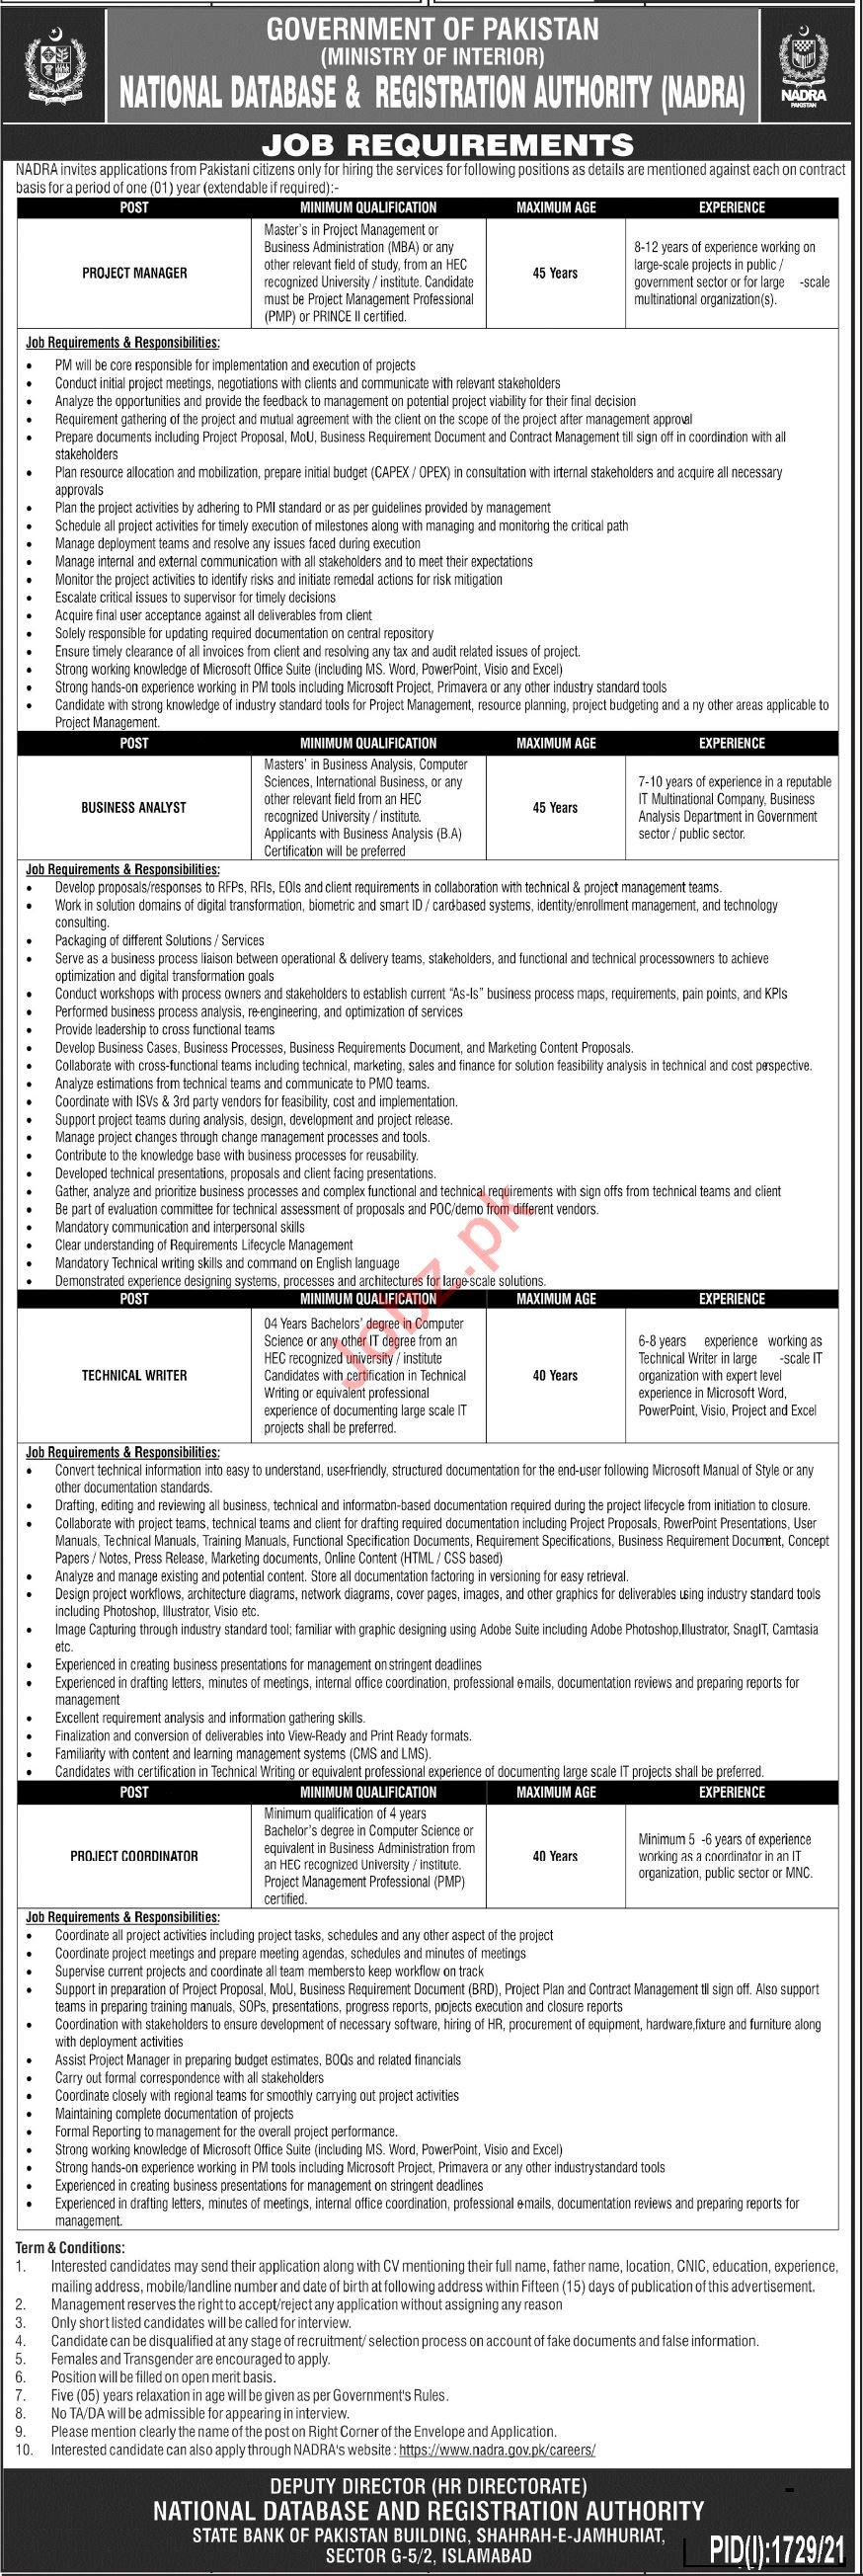 National Database & Registration Authority NADRA Jobs 2021